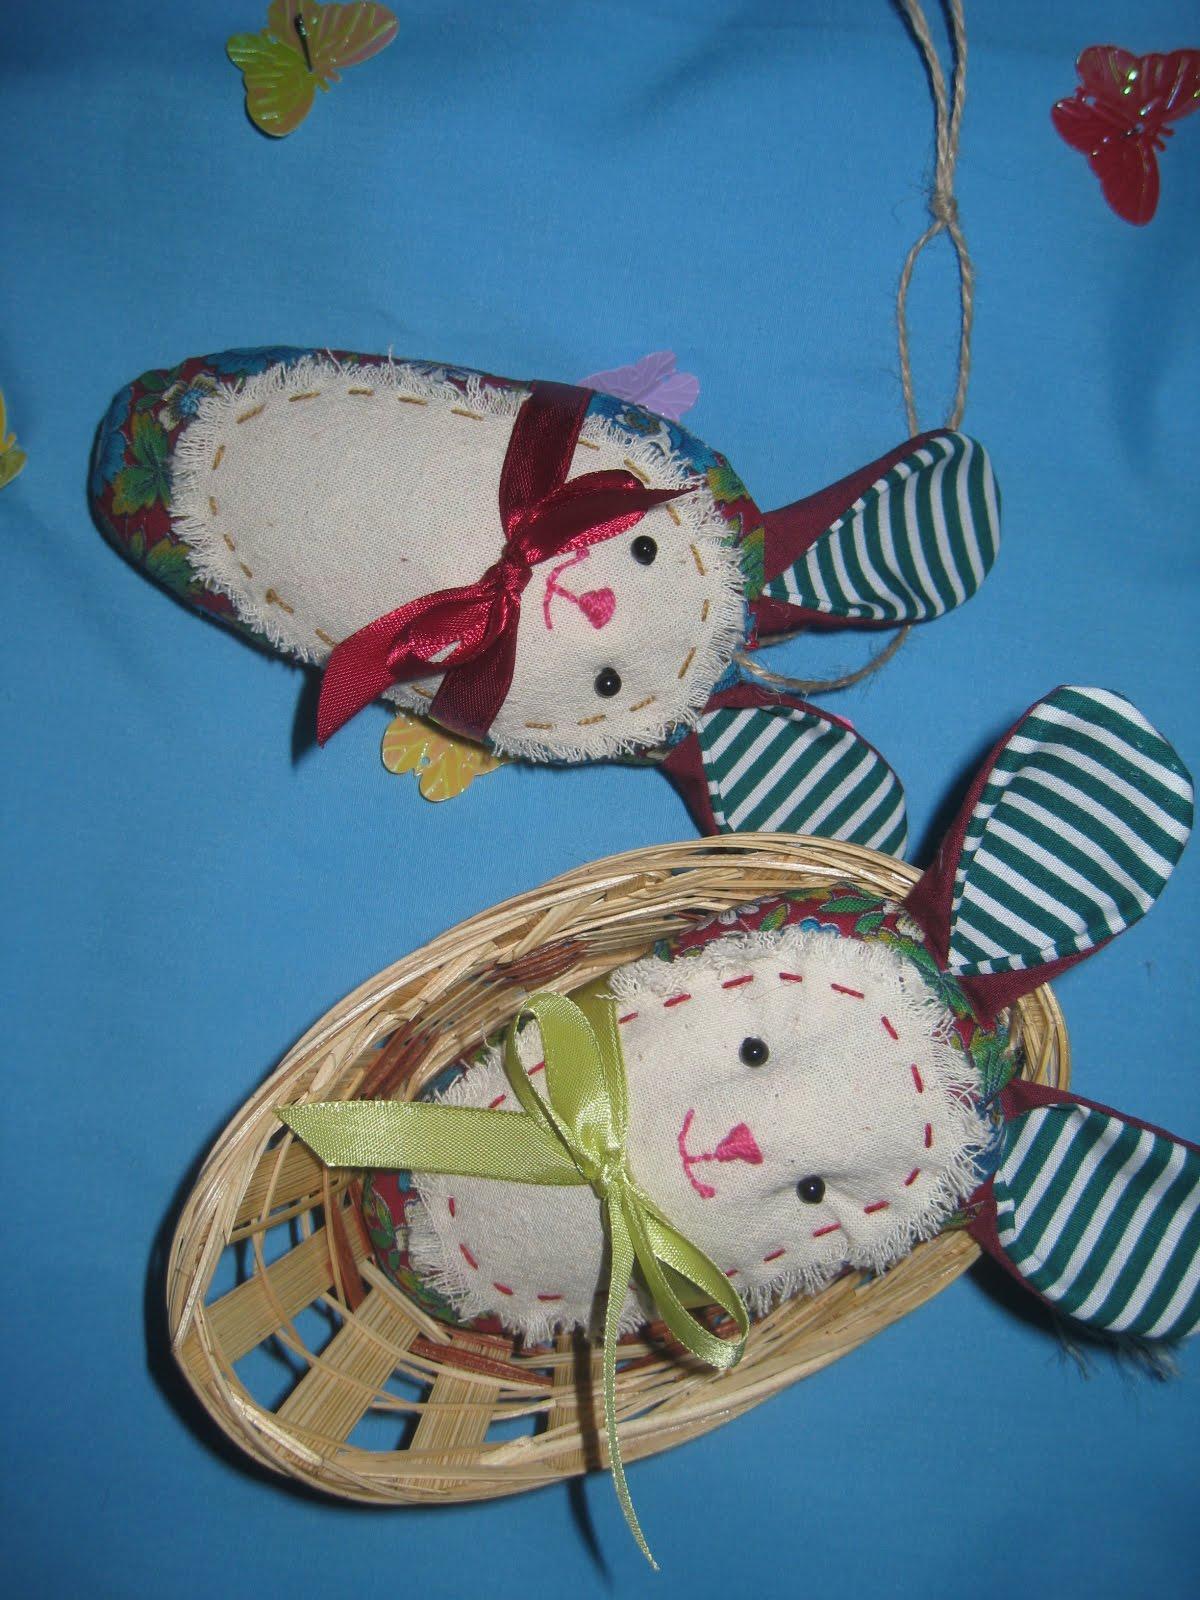 Nkale в каждой игрушке сердце пасха